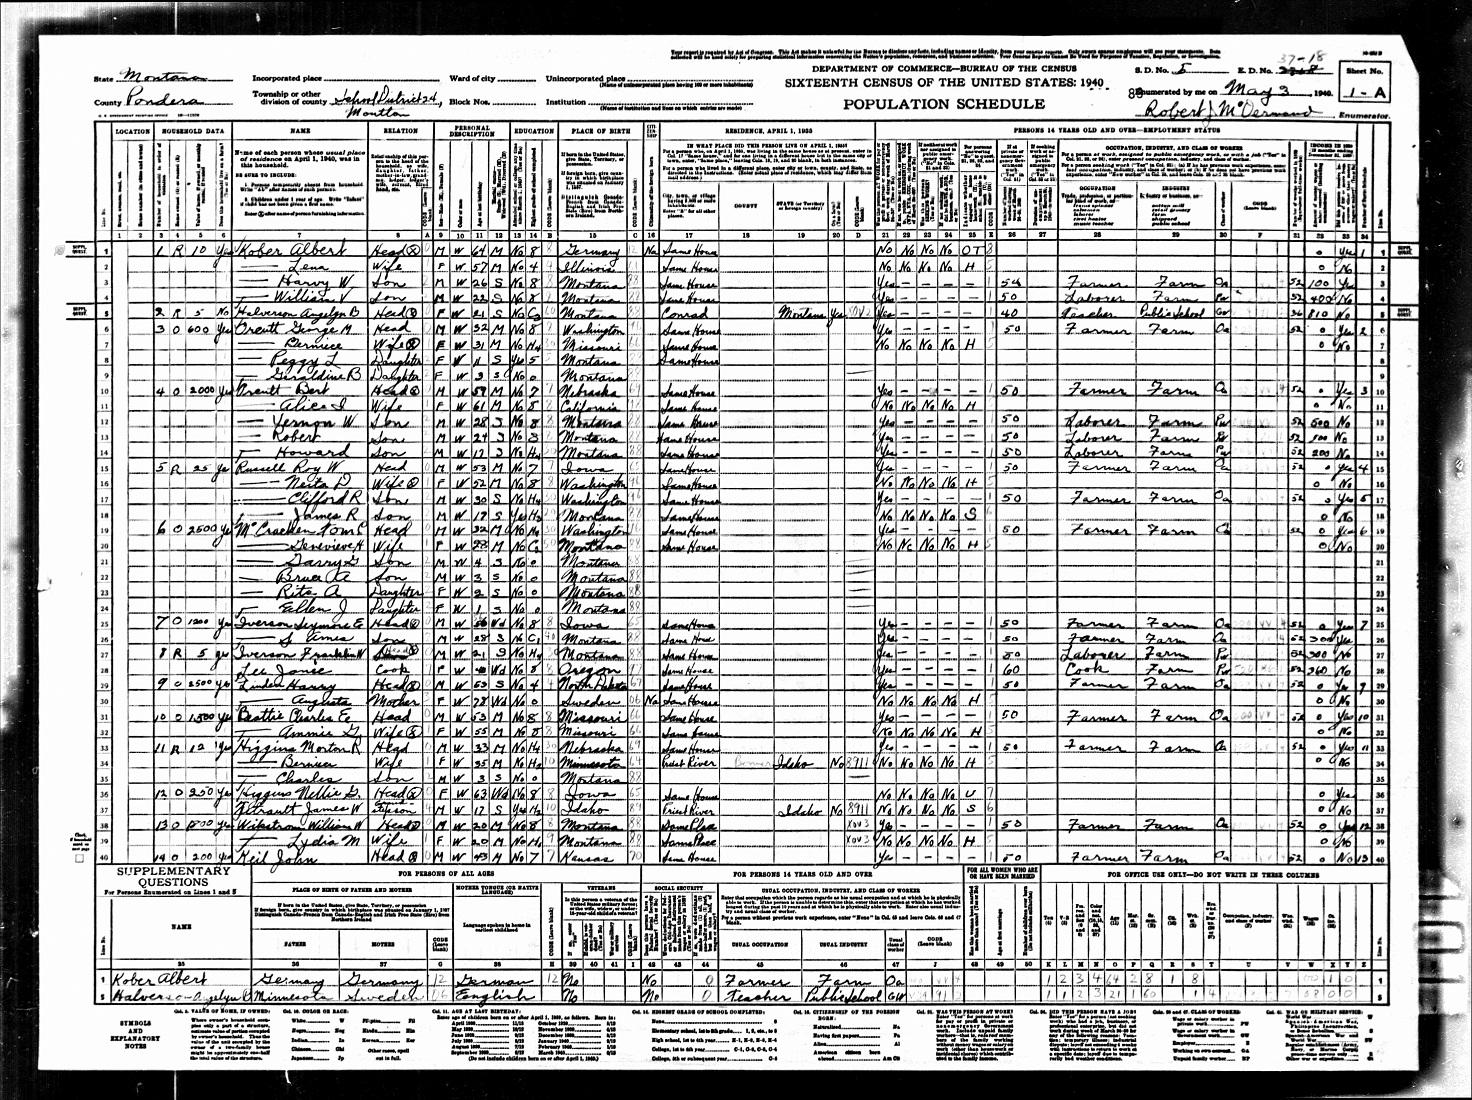 Montana pondera county ledger -  1940 Census Moulton Pondera County Montana Missing Mildred